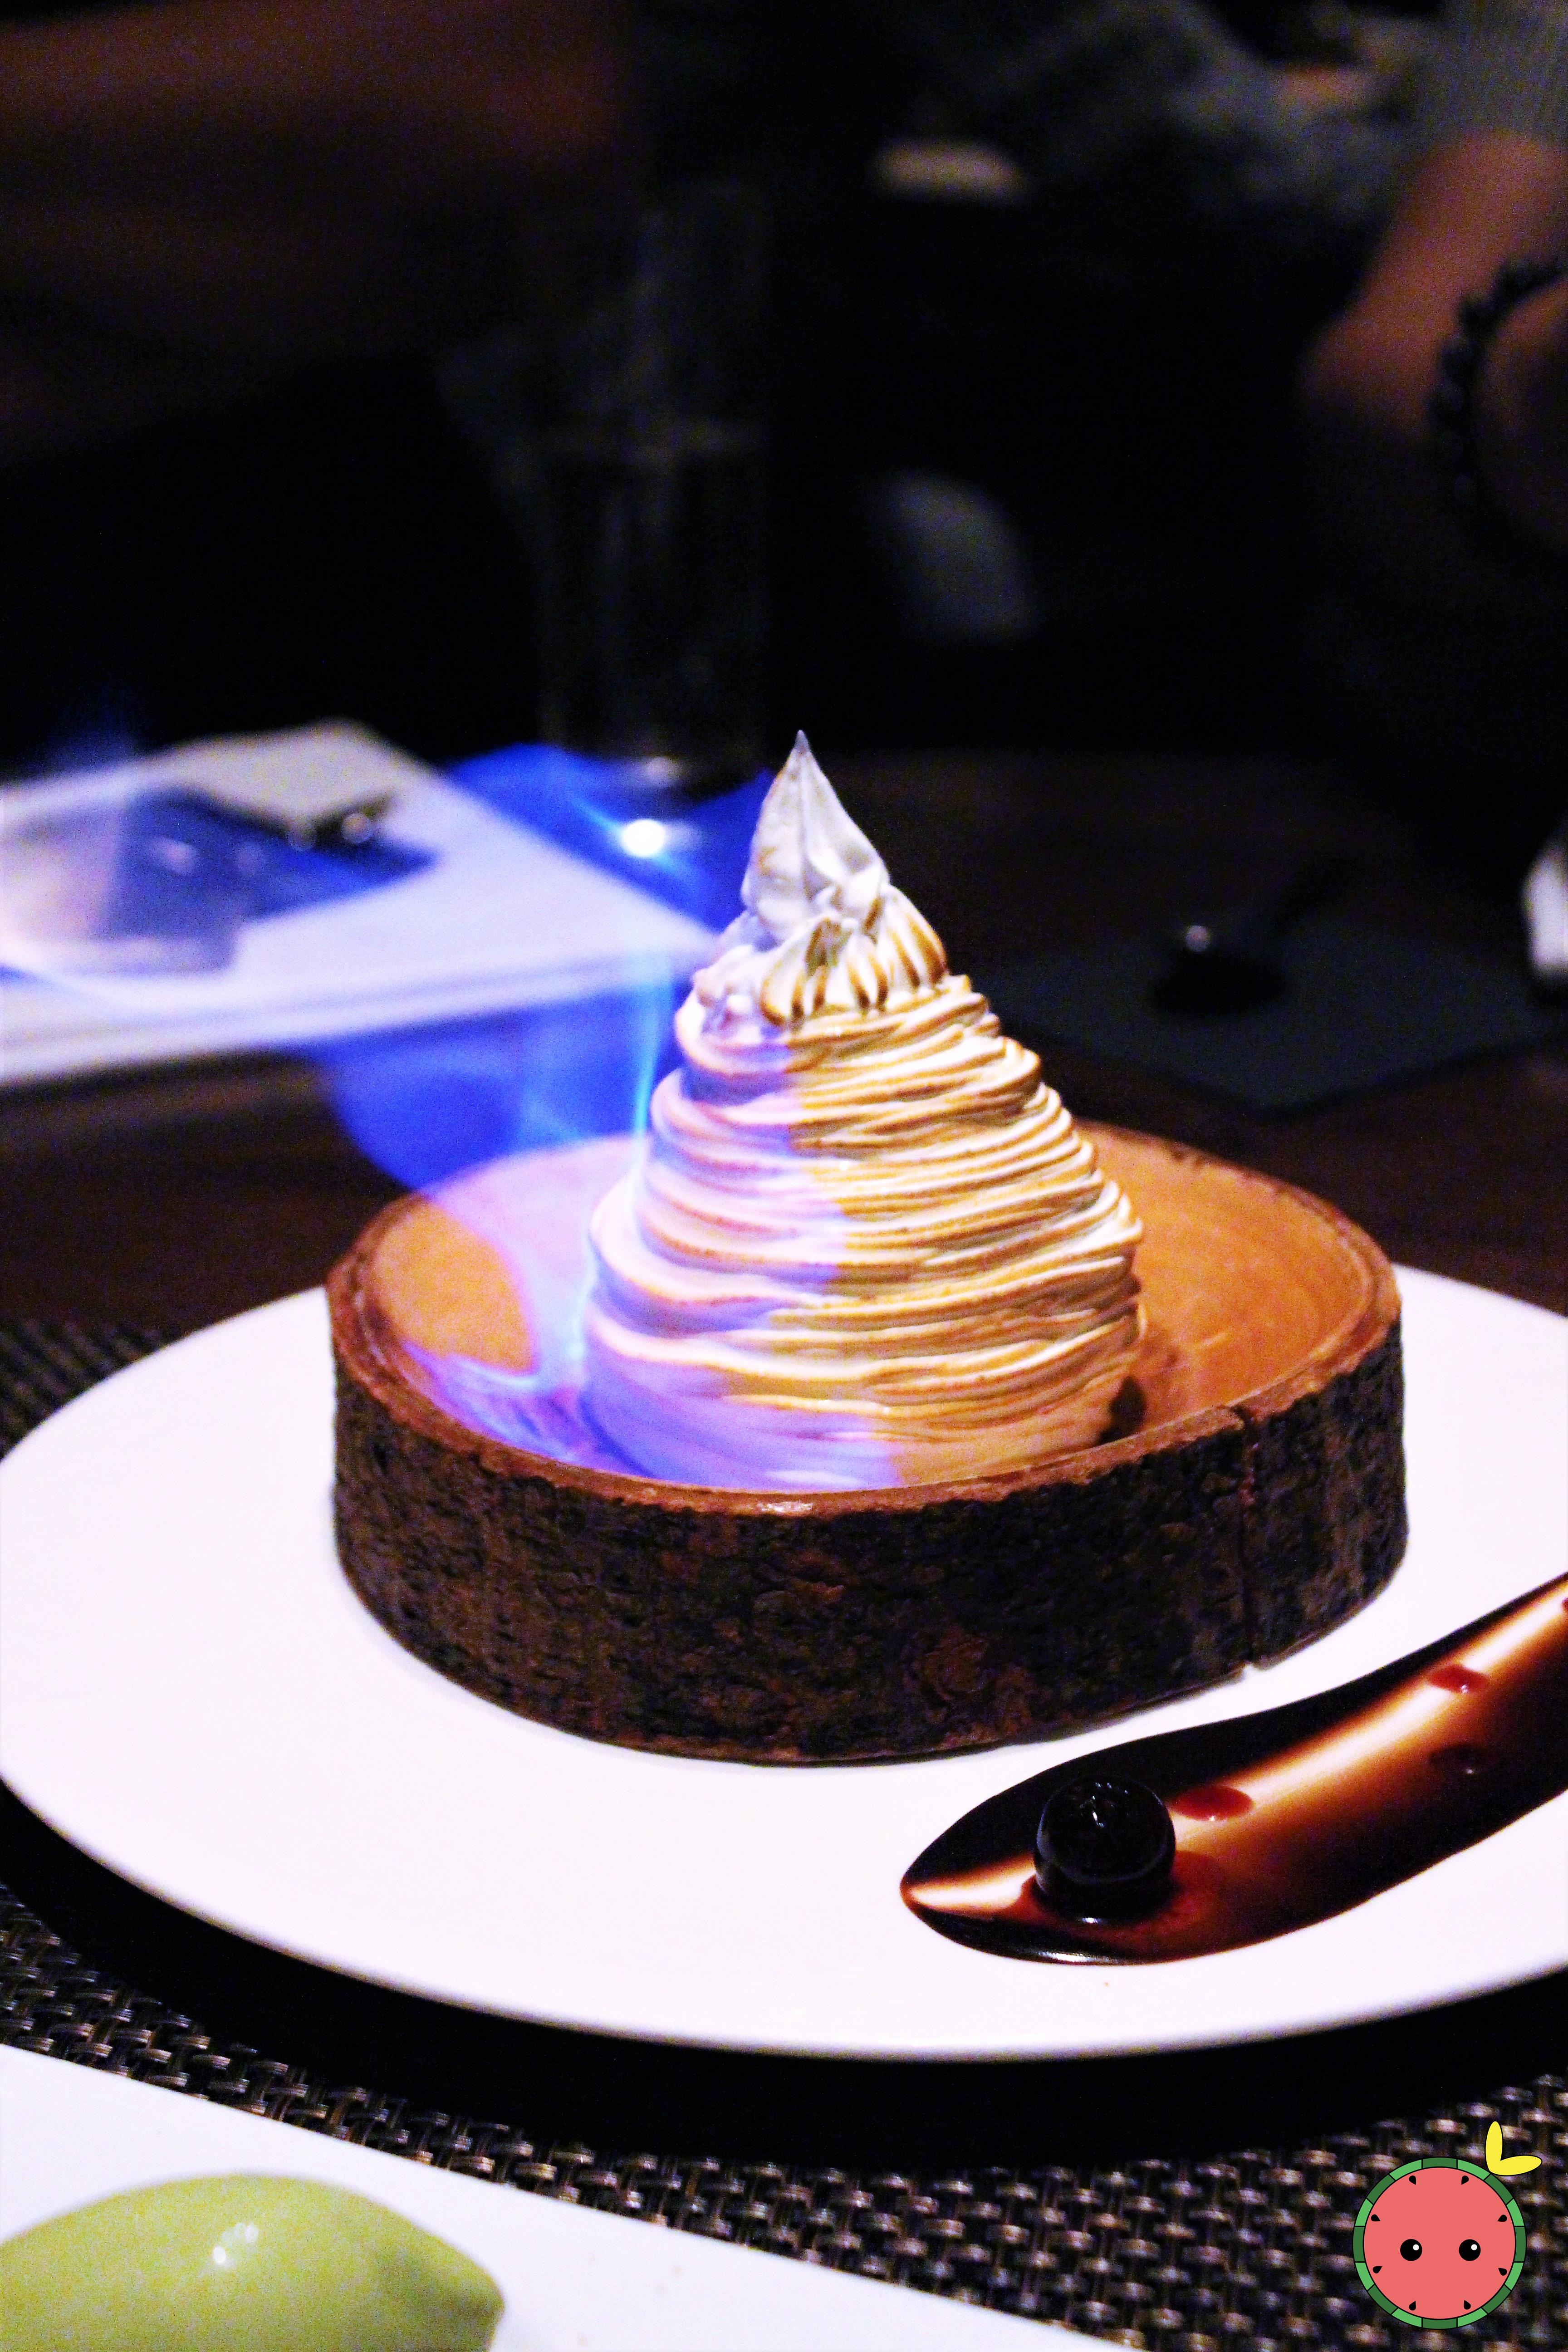 BFBA (Black Forest Baked Alaska) - Devil's Food Cake, Italian Meringue, Tahitian Vanilla Ice Cream,